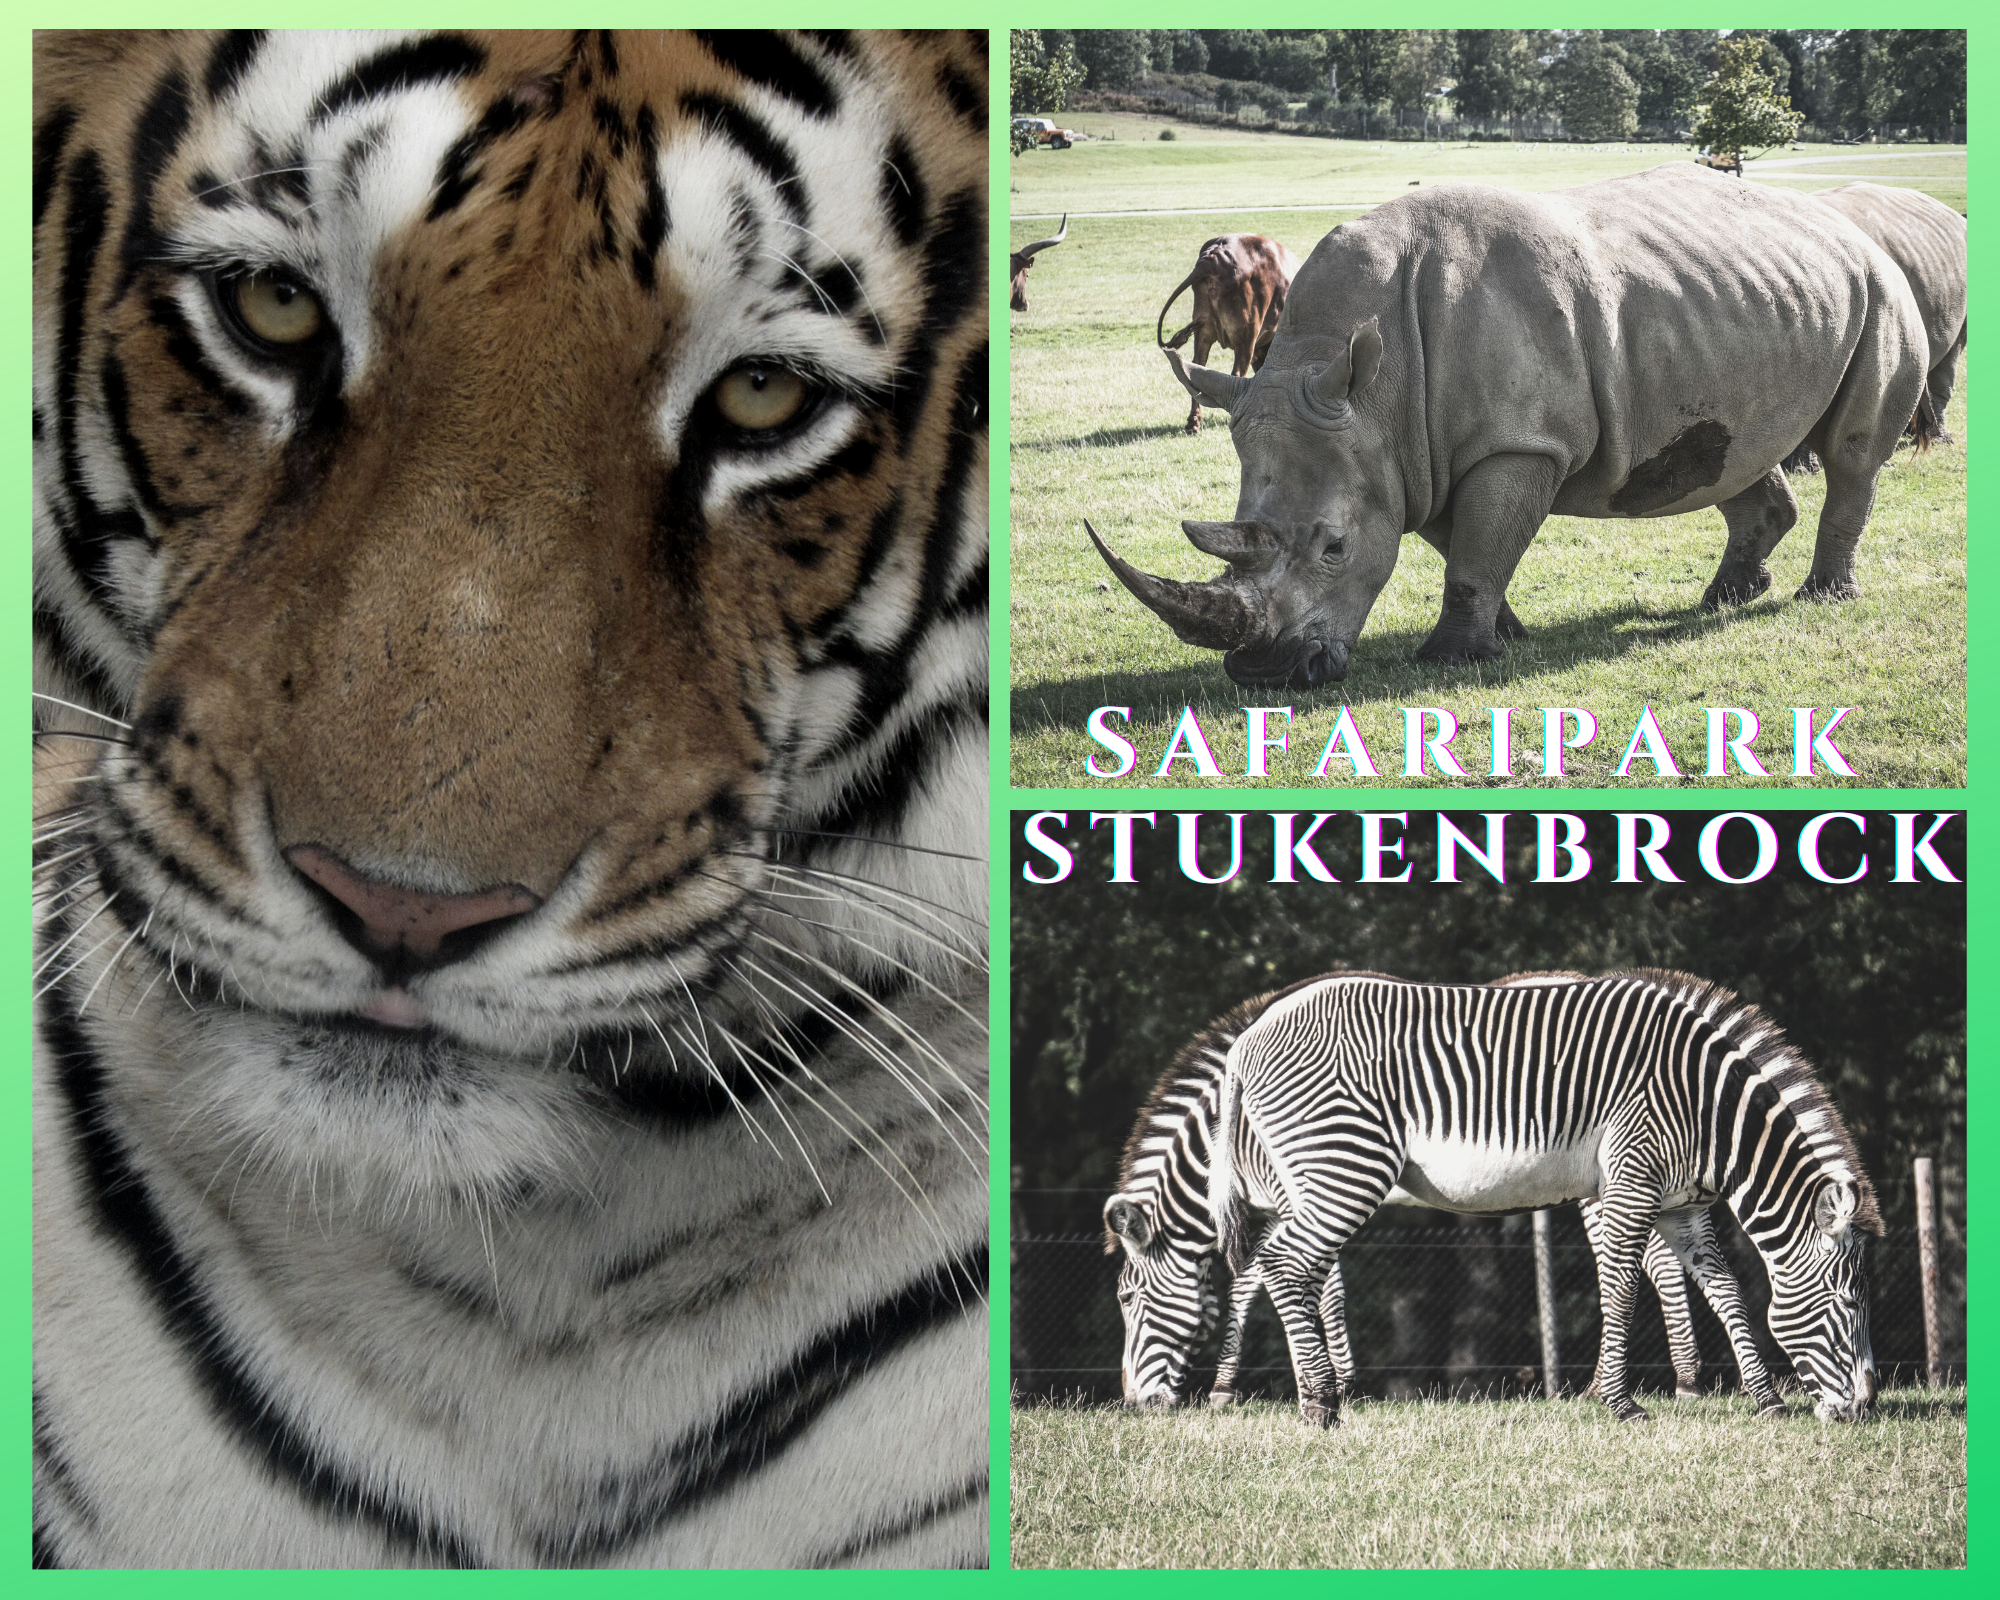 Safaripark Stukenbrock Zoo und Freizeitpark am 31.08.2021